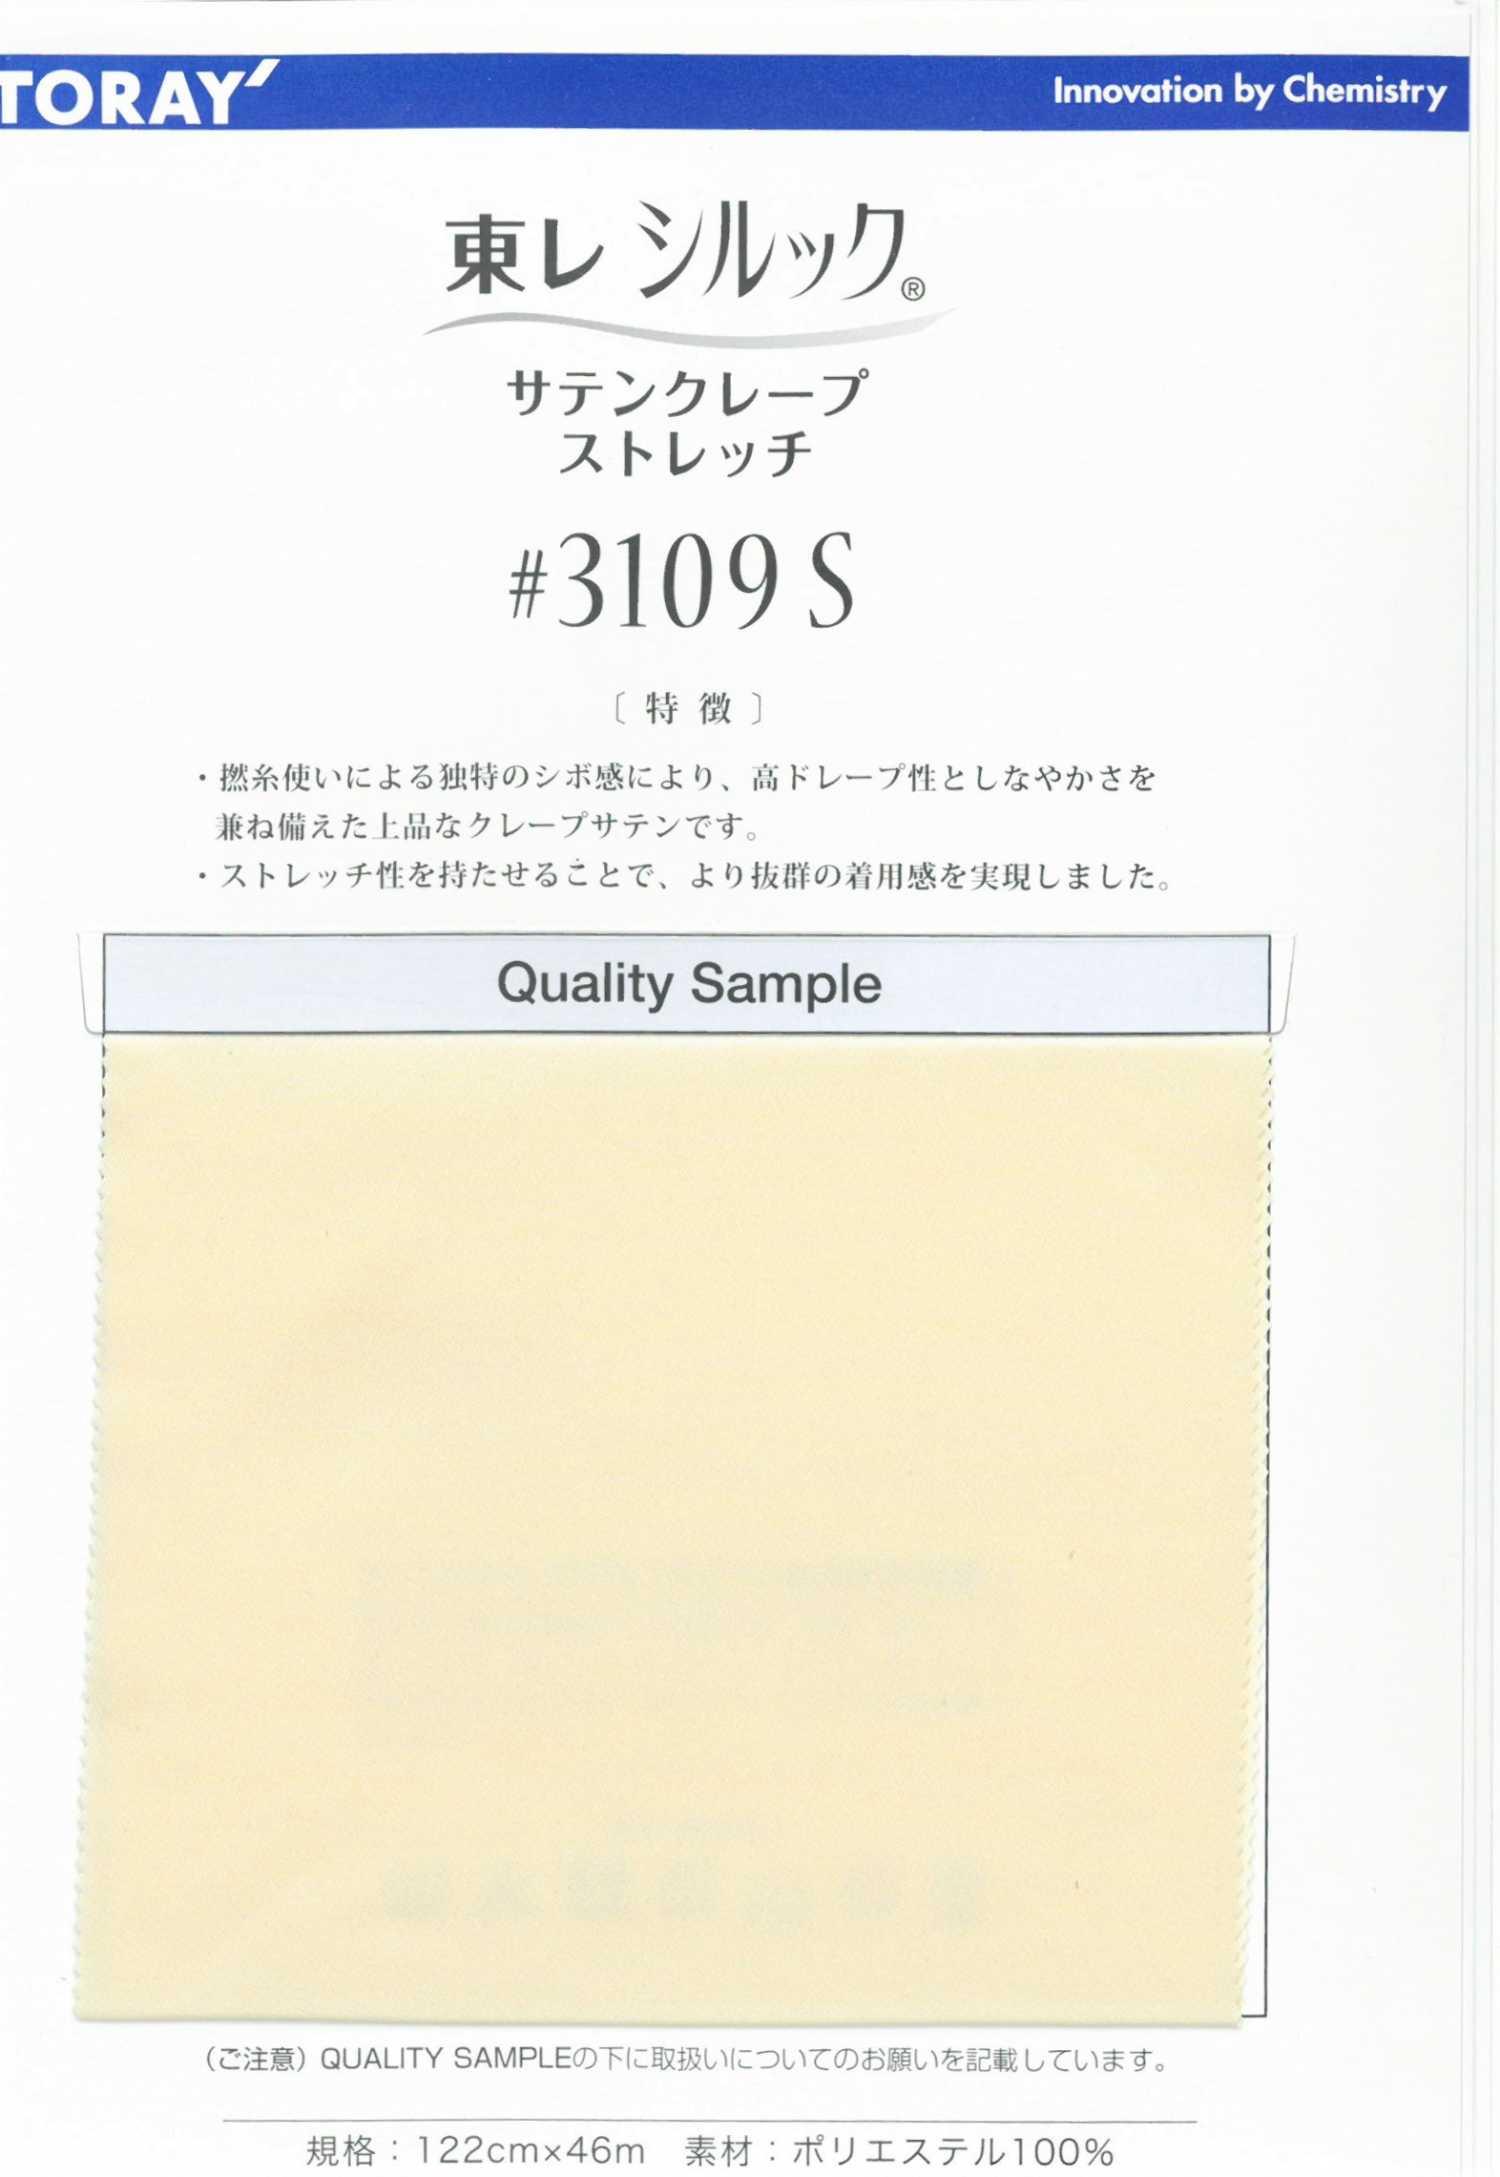 3109S サテンクレープストレッチ裏地 東レシルック 東レ/オークラ商事 - ApparelX アパレル資材卸通販